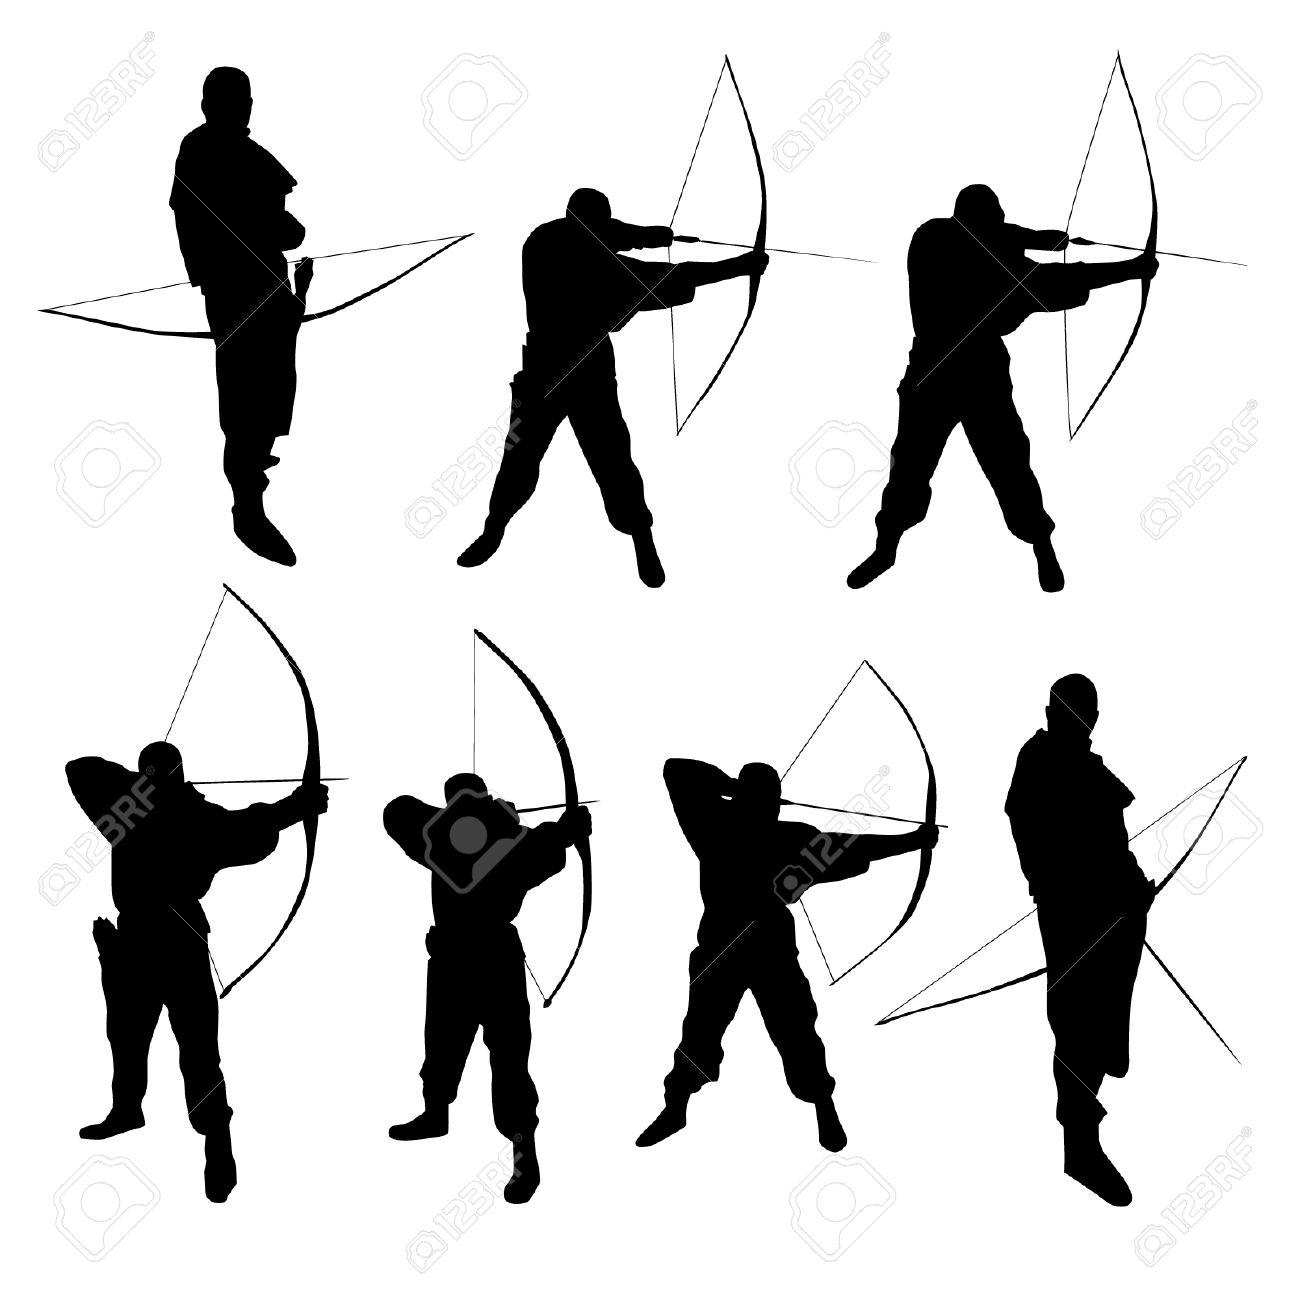 Archery clipart silhouette. Archer